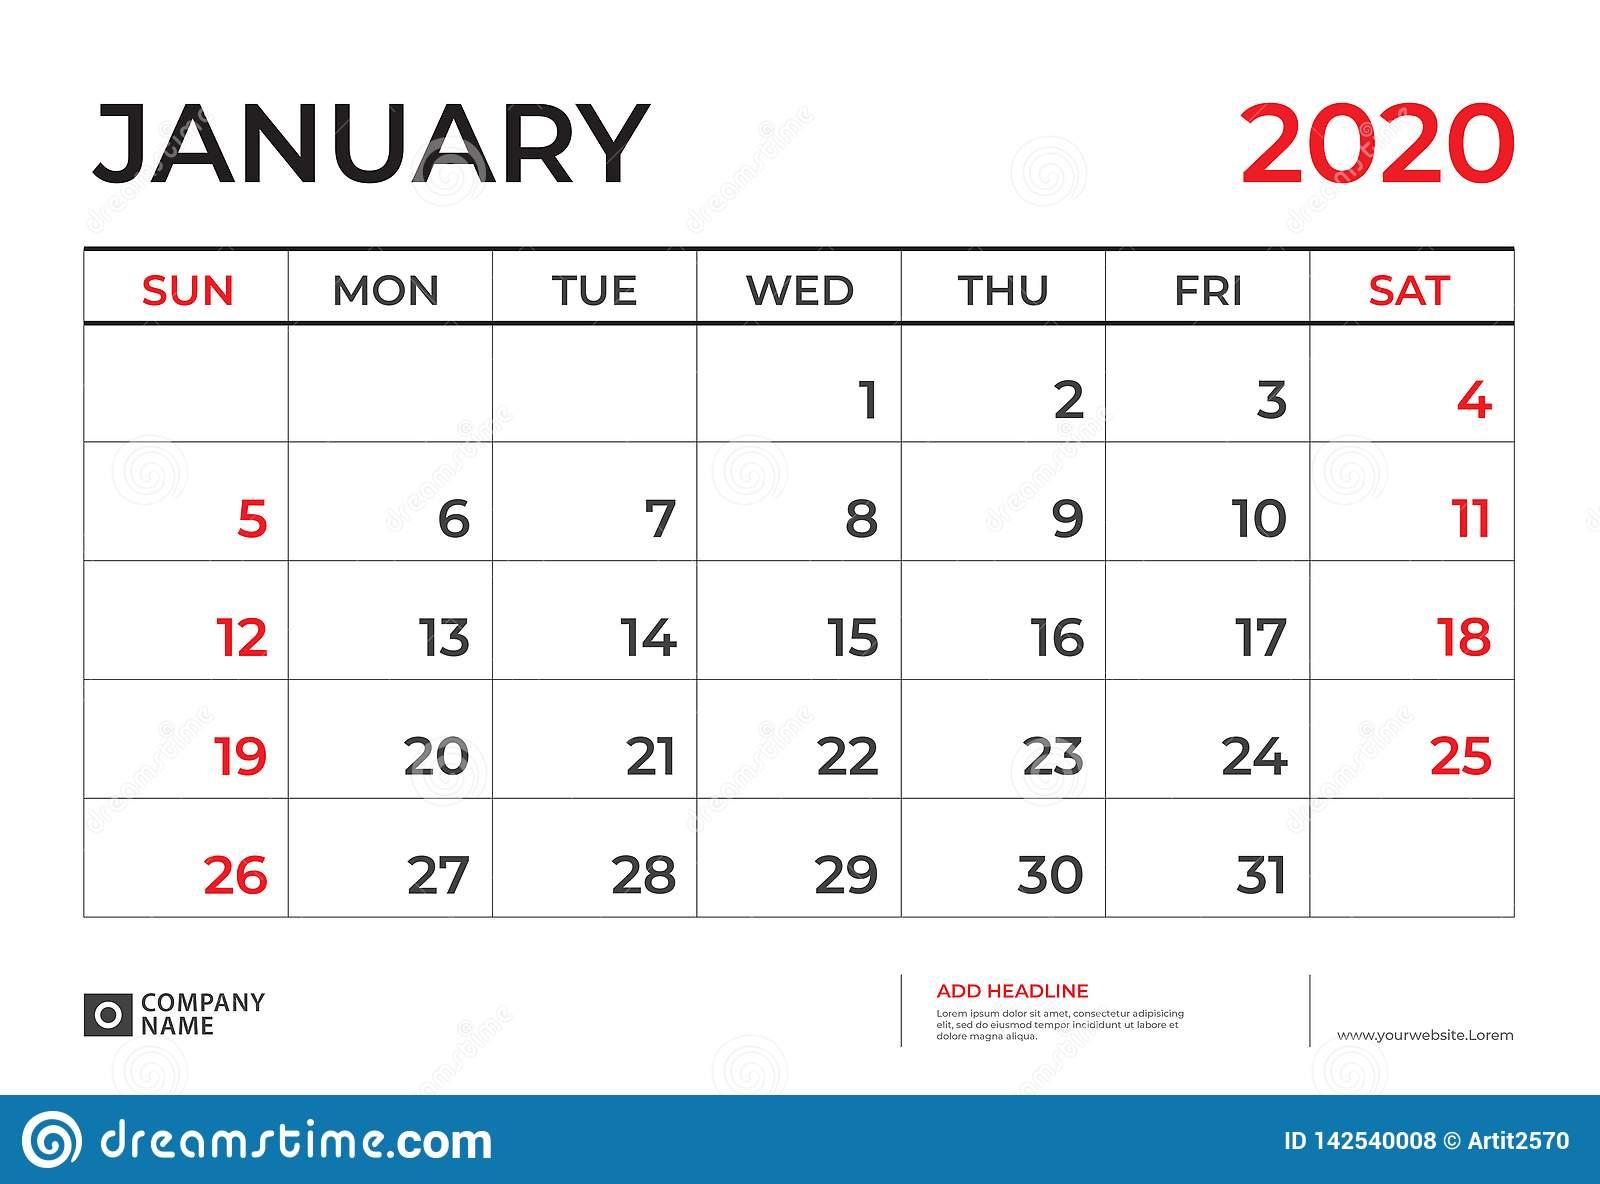 January 2020 Calendar Template, Desk Calendar Layout Size